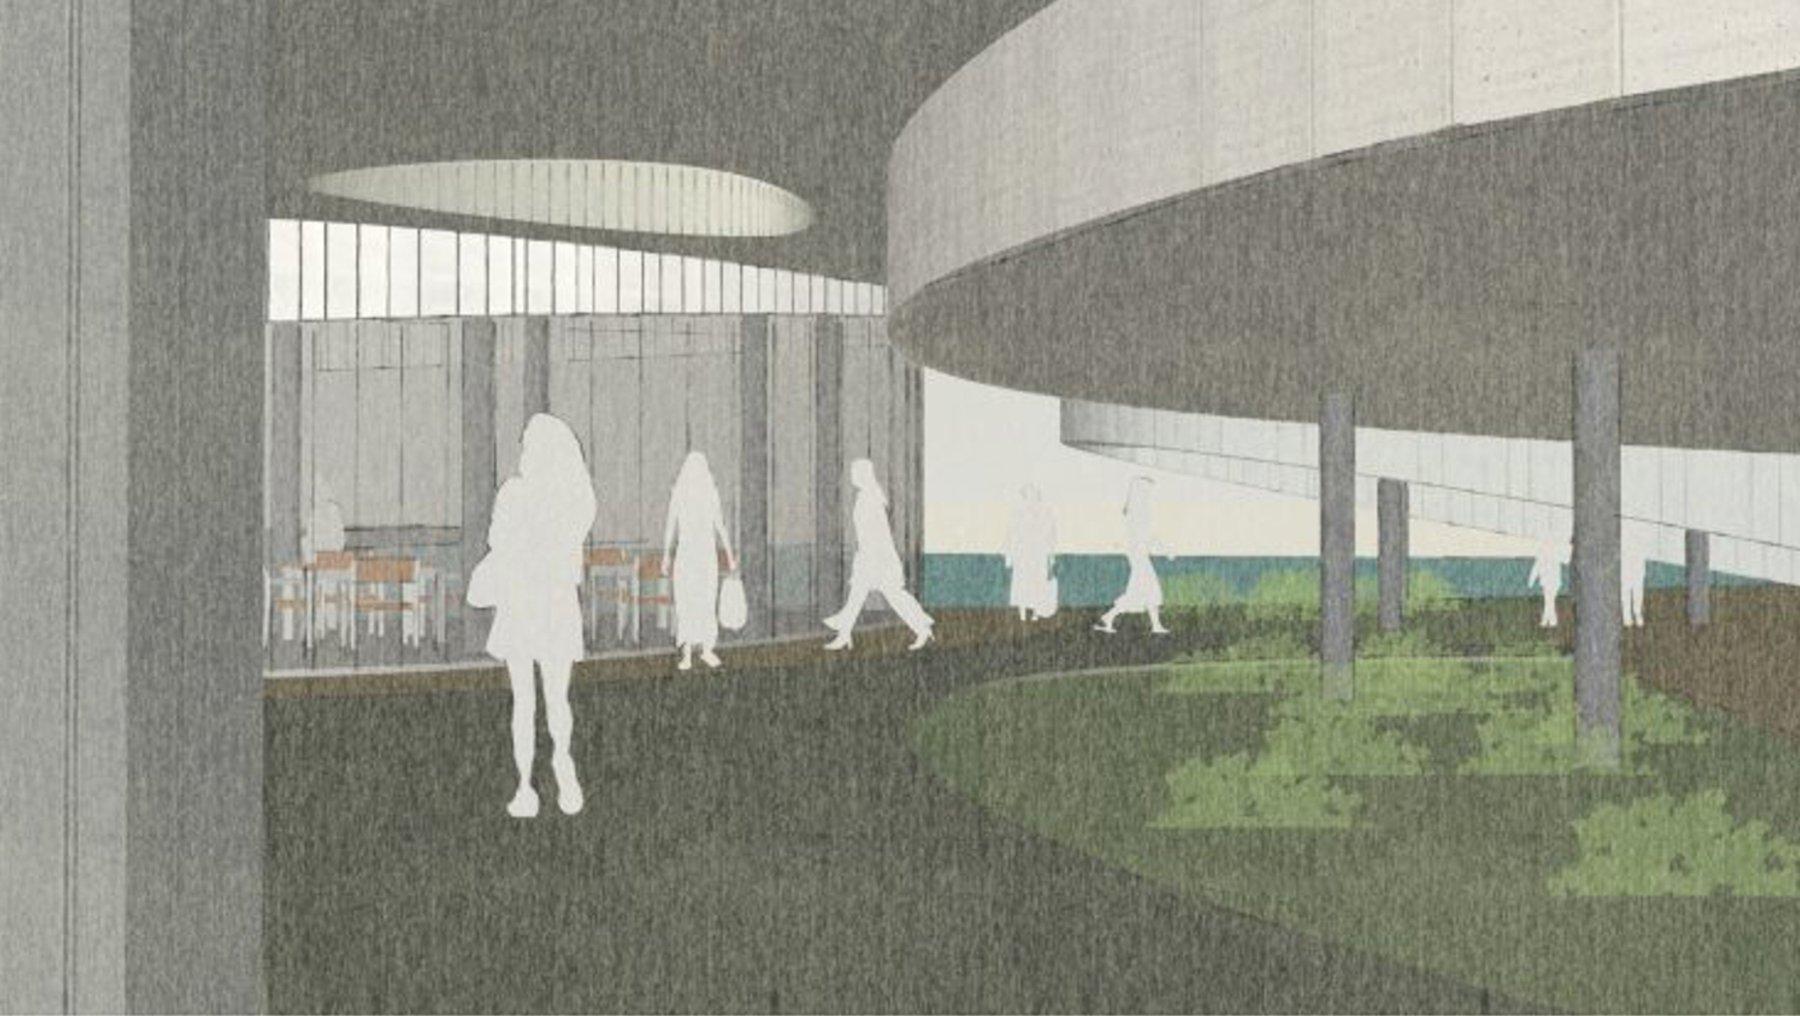 Architekturentwurf Ozeaneum von Ana Paola Alvarado